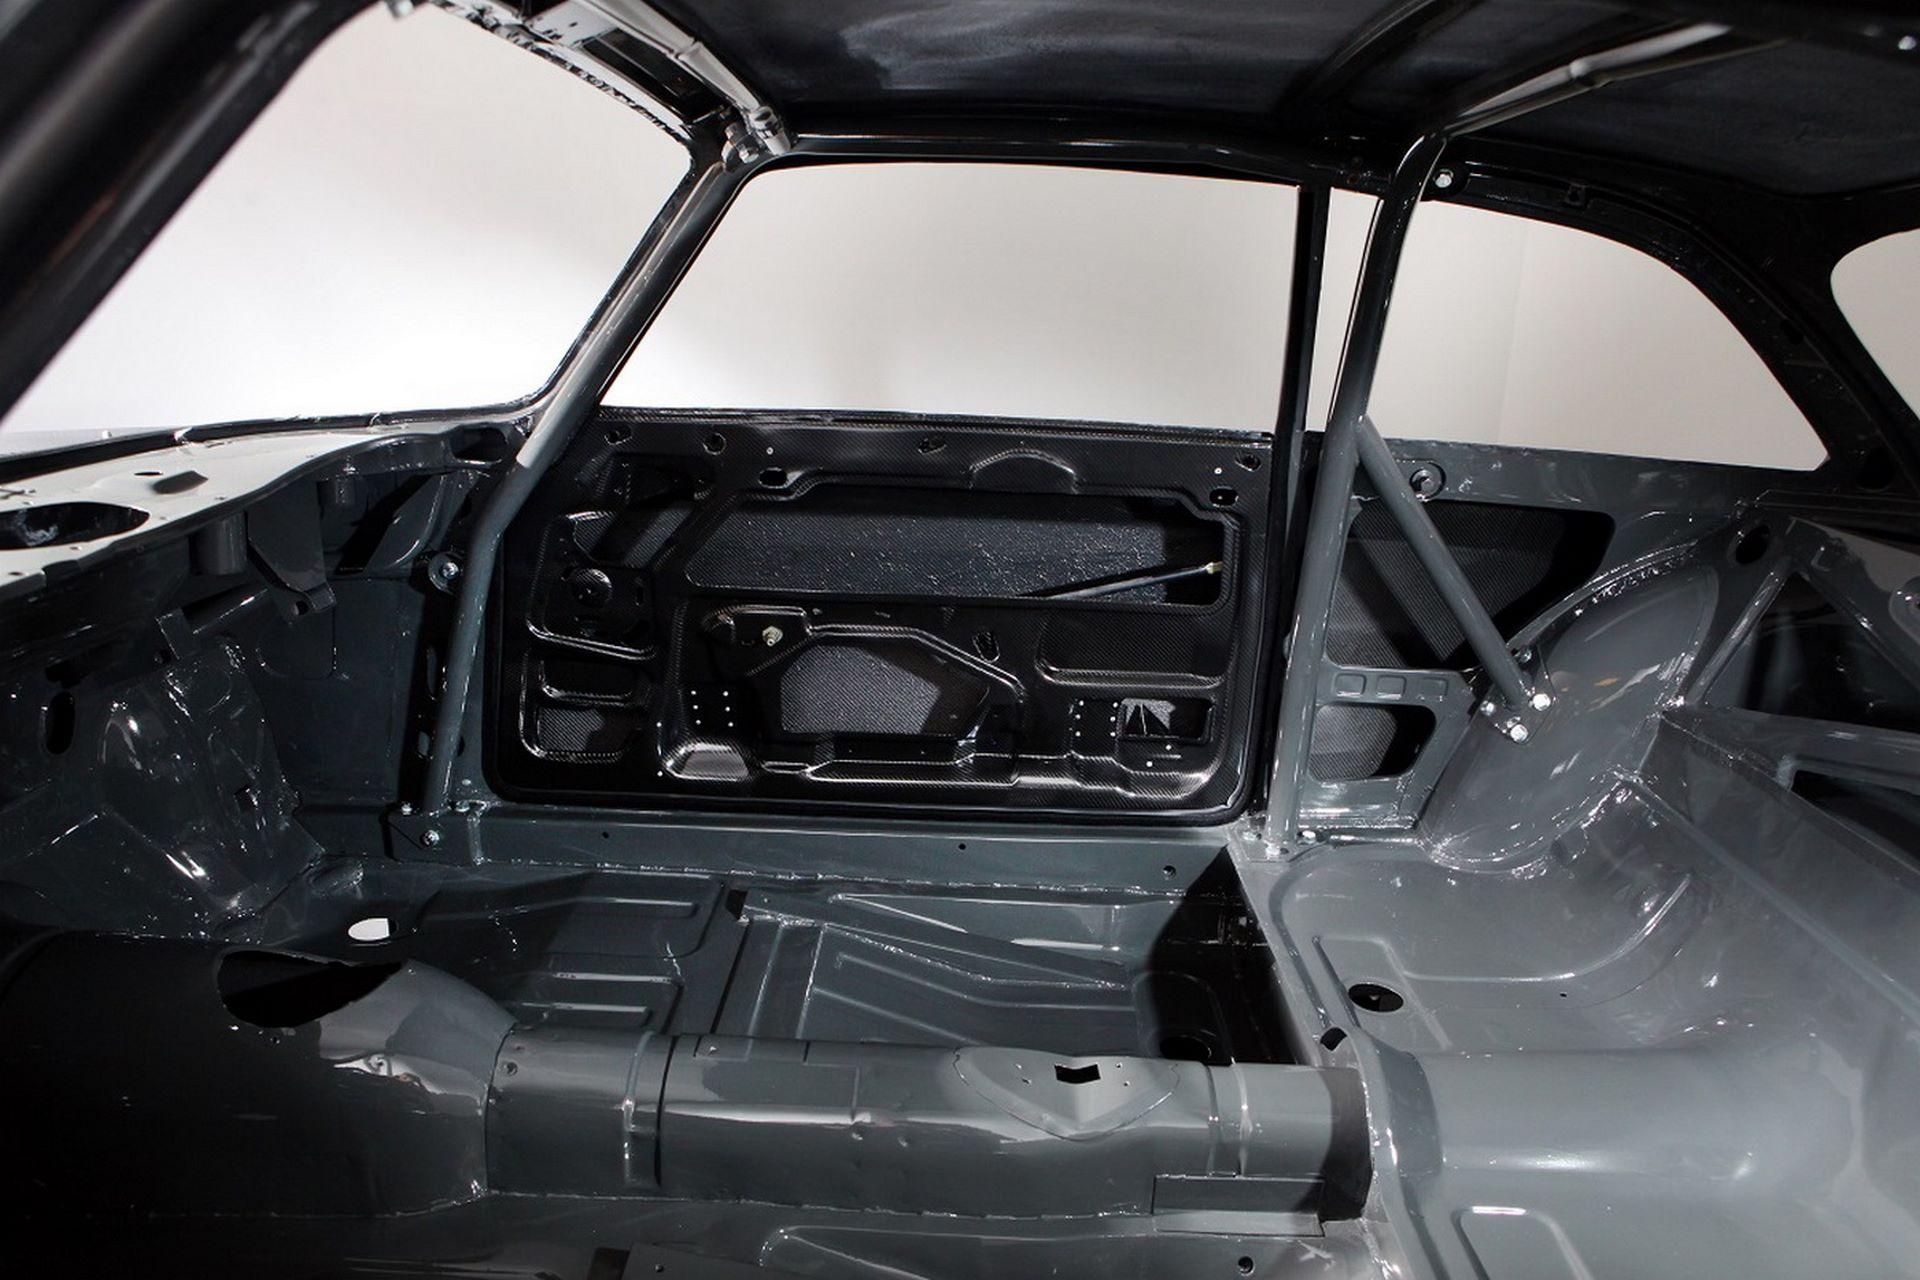 Carbon-Alfa-Romeo-Giulia-by-Alfaholics-6